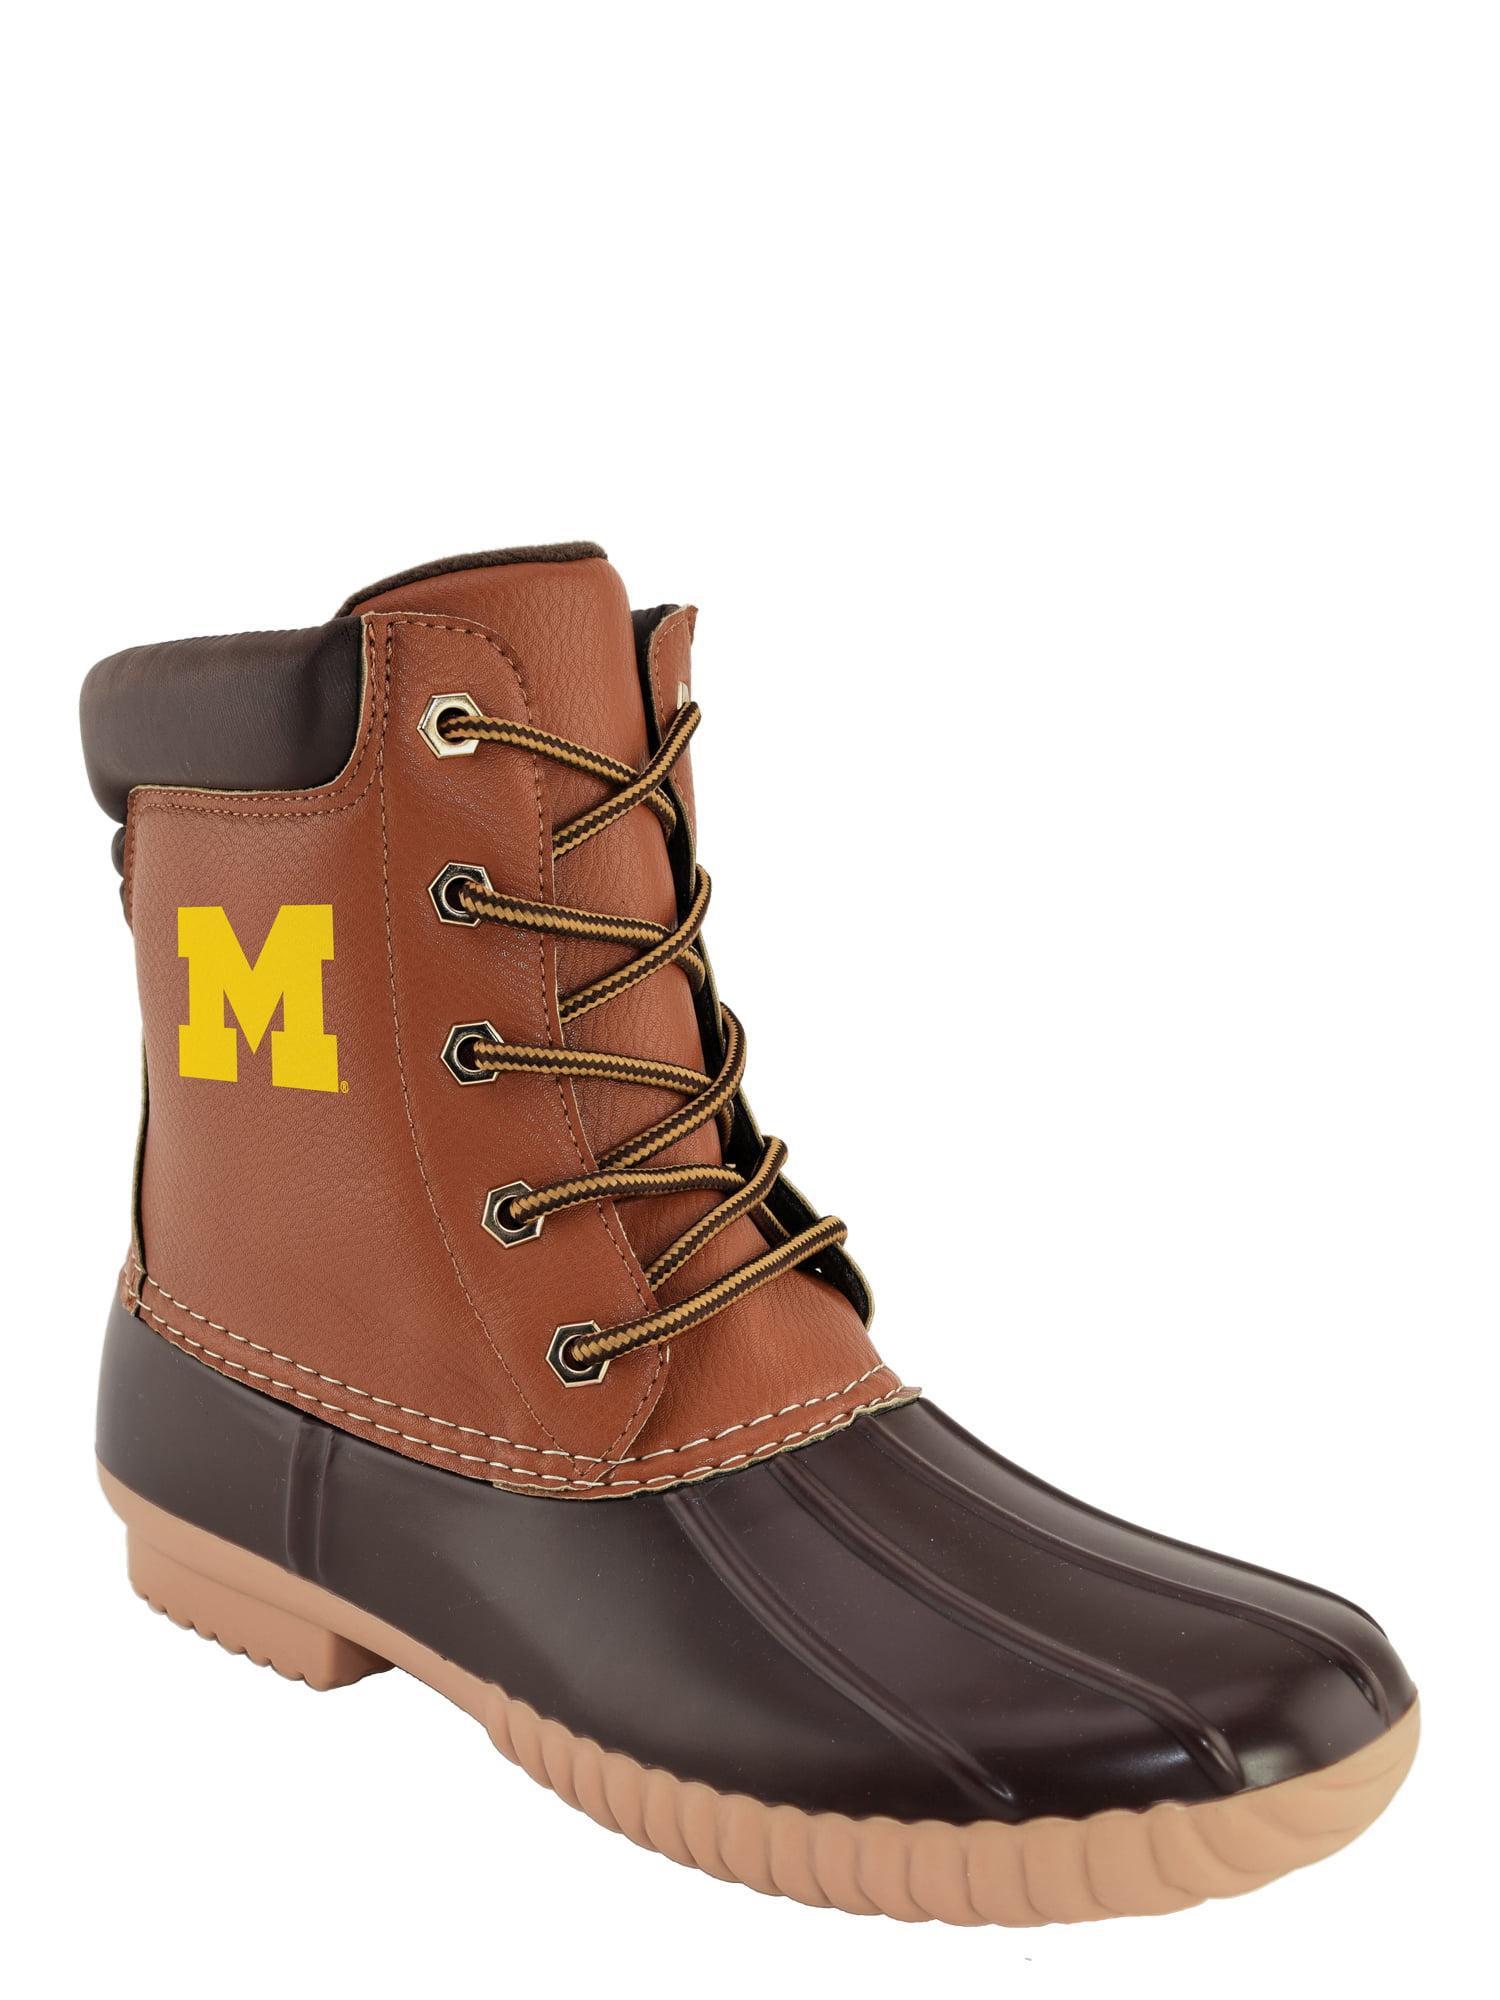 NCAA Men's Michigan -Duck Boot by RENAISSANCE IMPORTS INC